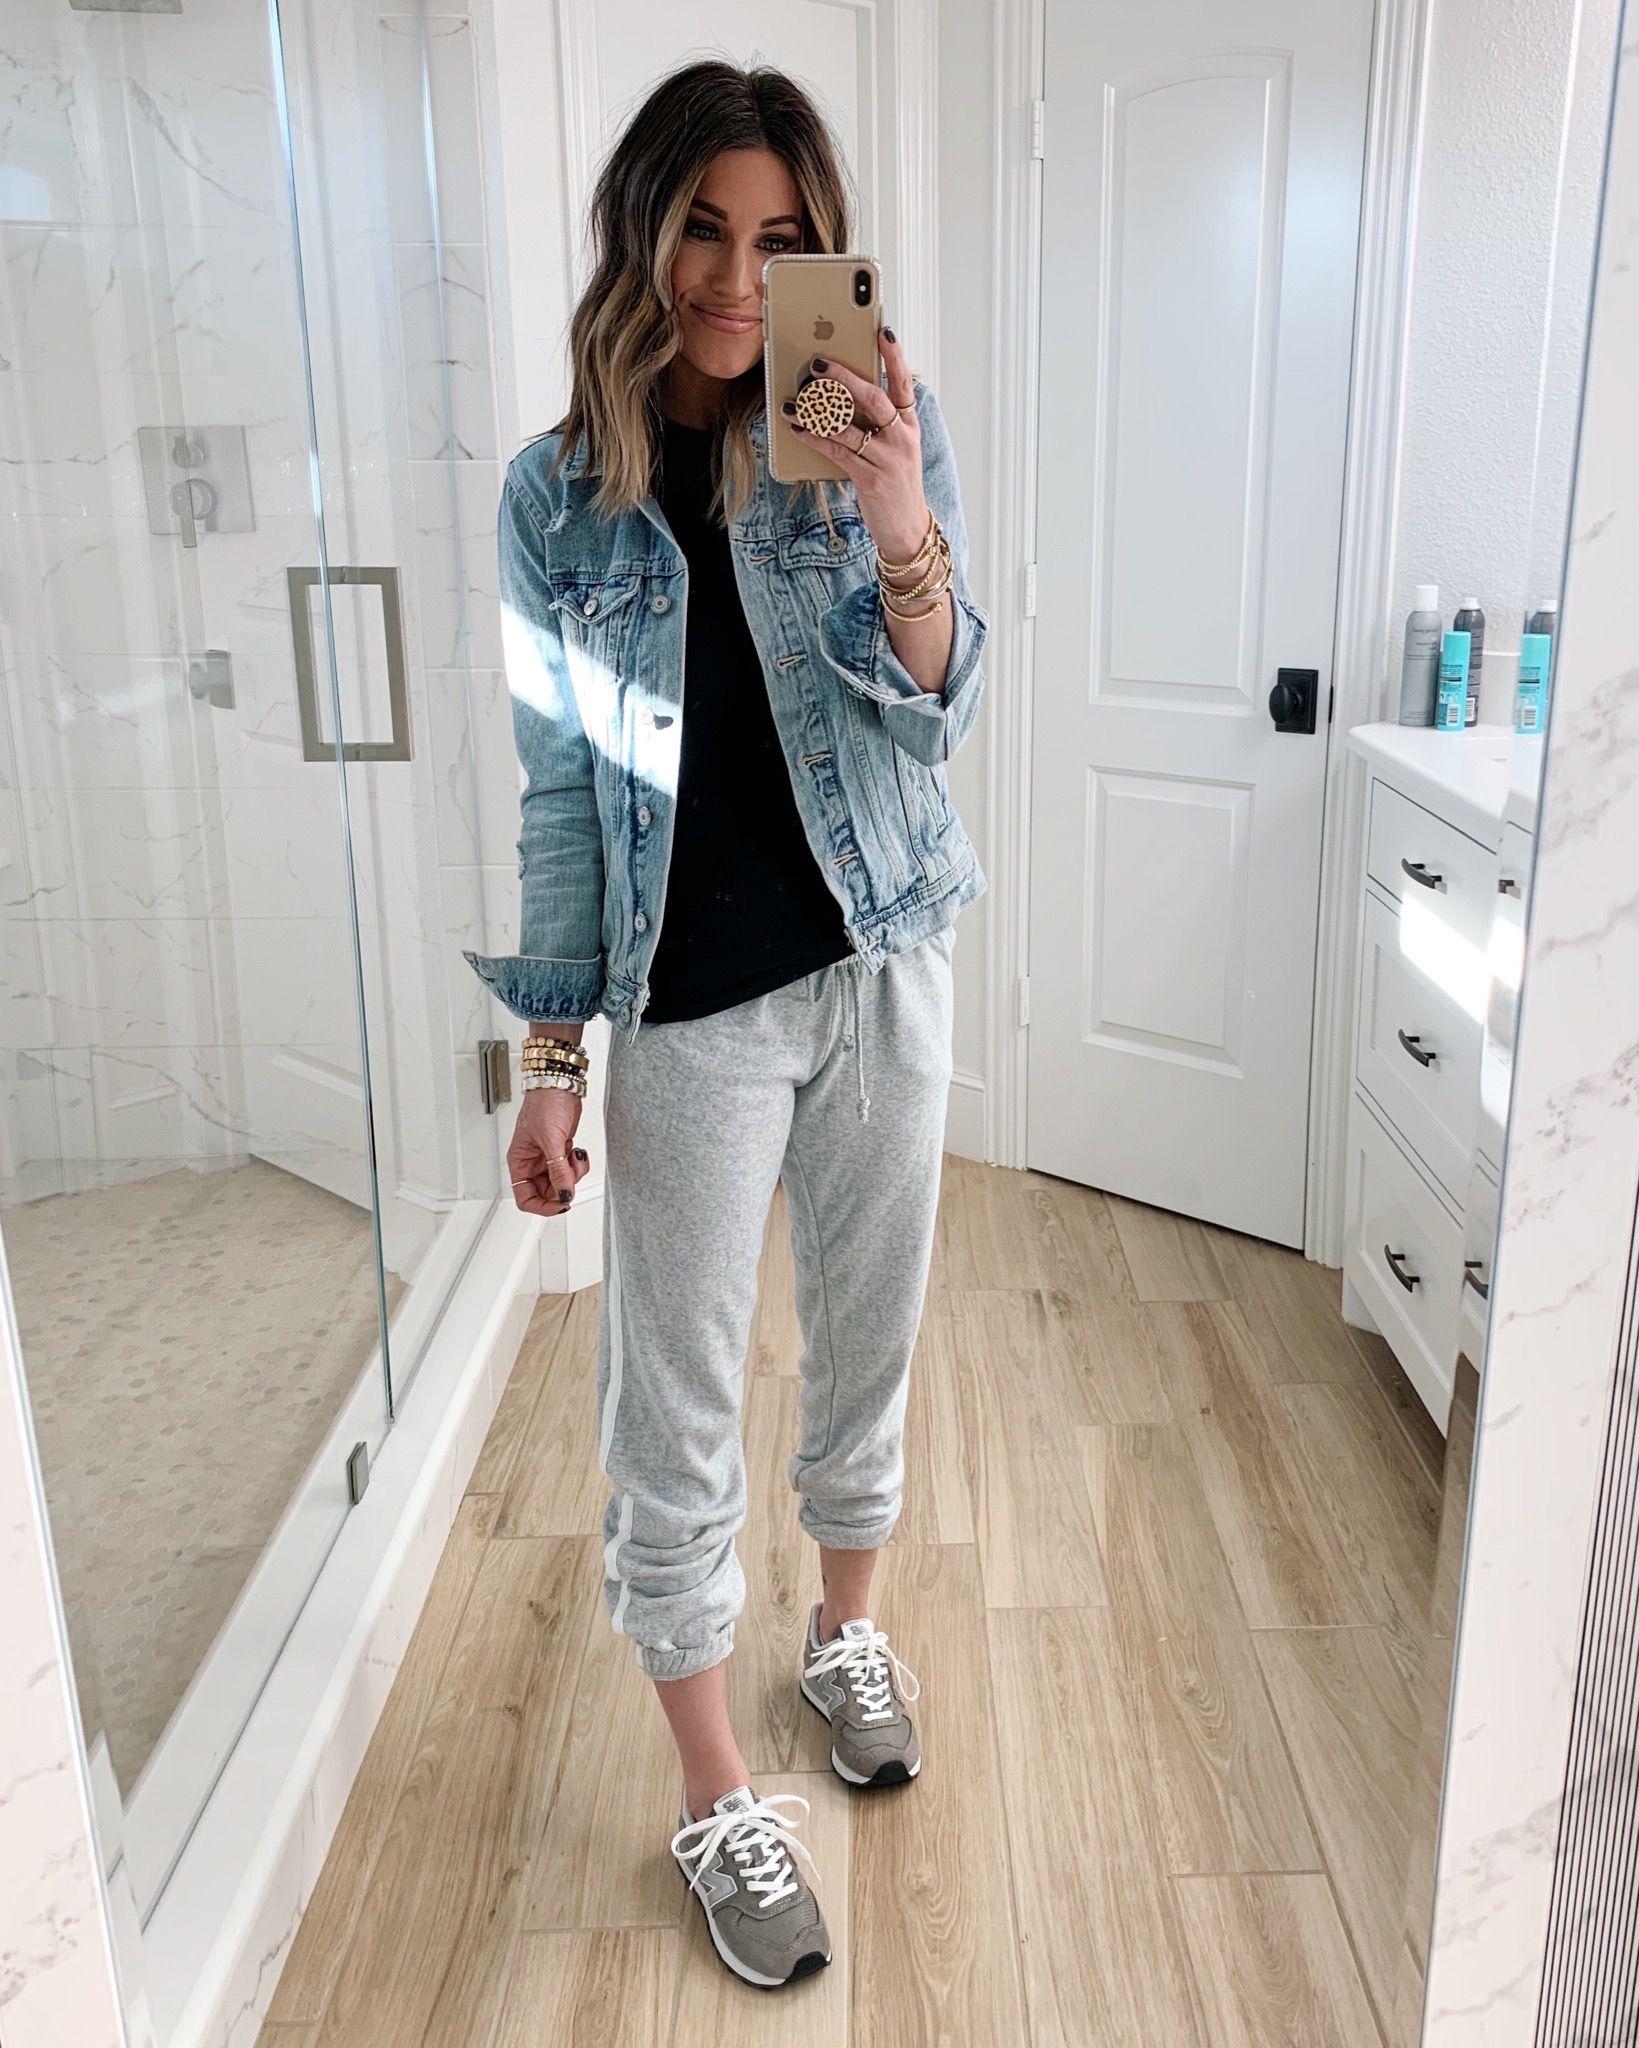 30 Ways To Style A Denim Jacket The Sister Studio Denim Jacket Fashion Denim Jacket Jacket Outfits [ 2048 x 1639 Pixel ]